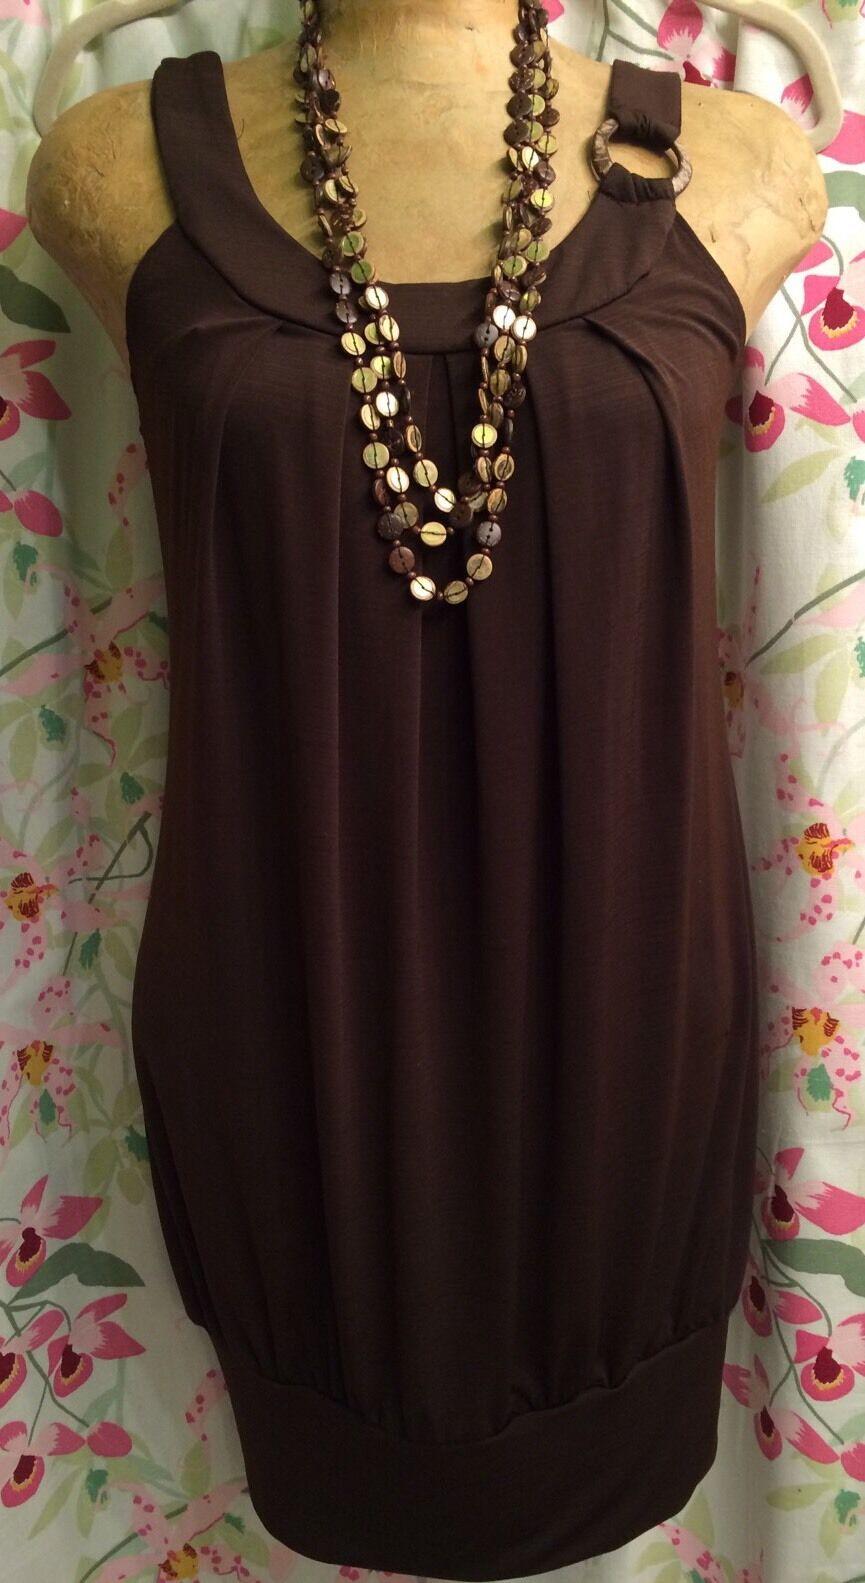 A.BYER WOMEN'S MED. SLINKY STRETCH CHOCOLATE BROWN TUNIC DRESS SLEEVELESS USA